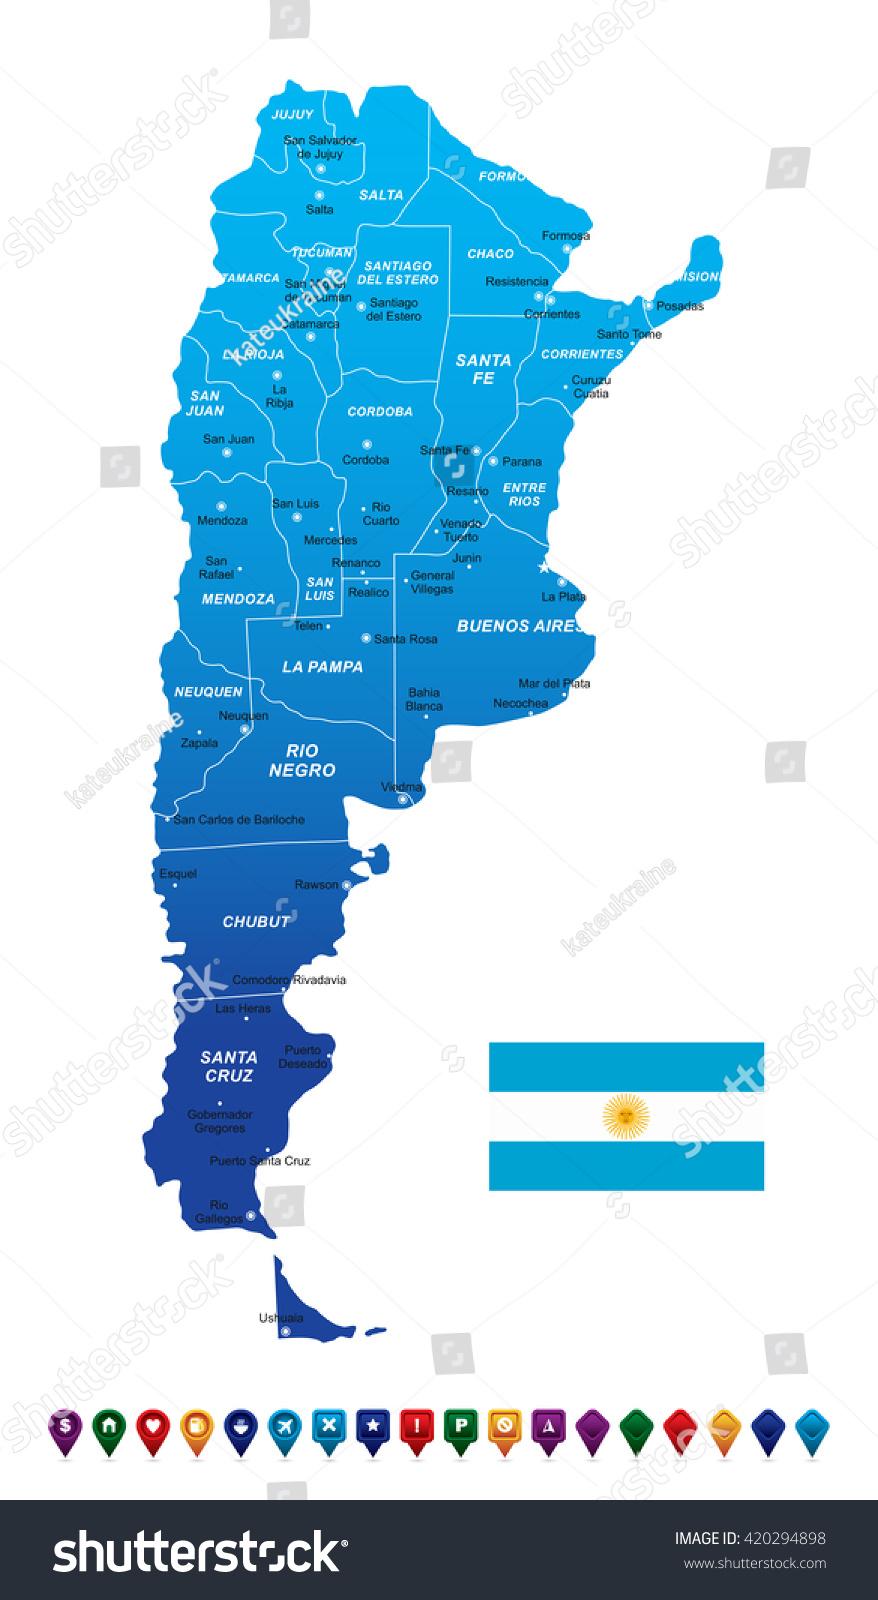 Argentina Map Vector Illustration Stock Vector - Argentina map bahia blanca